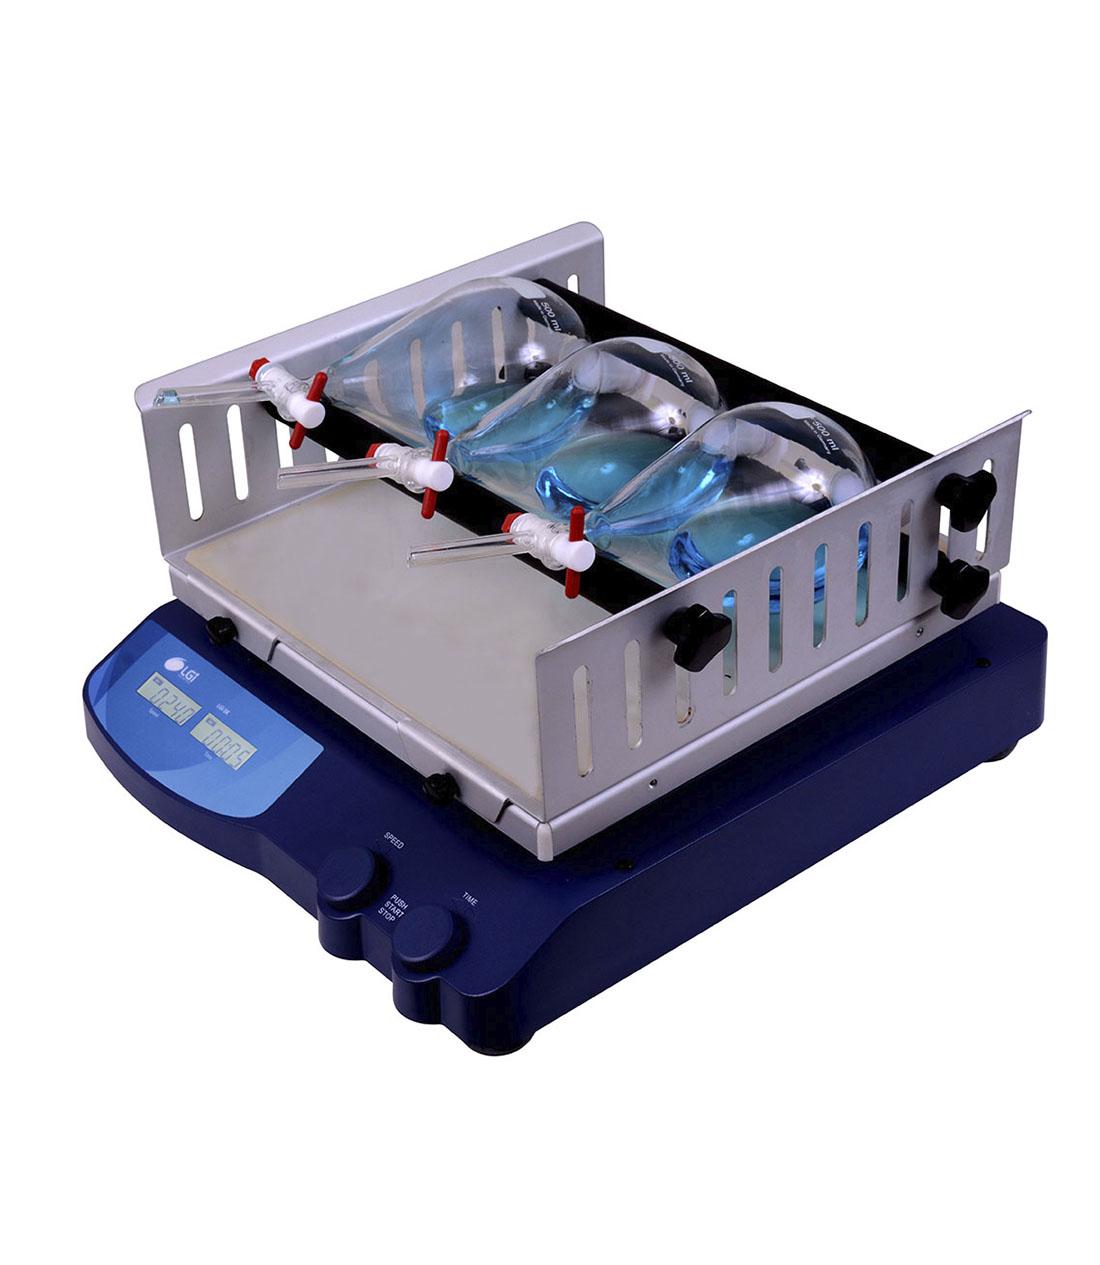 AGITADOR ORBITAL  100 - 500 RPM - LGI SCIENTIFIC - Cód. LGI-SK-O330